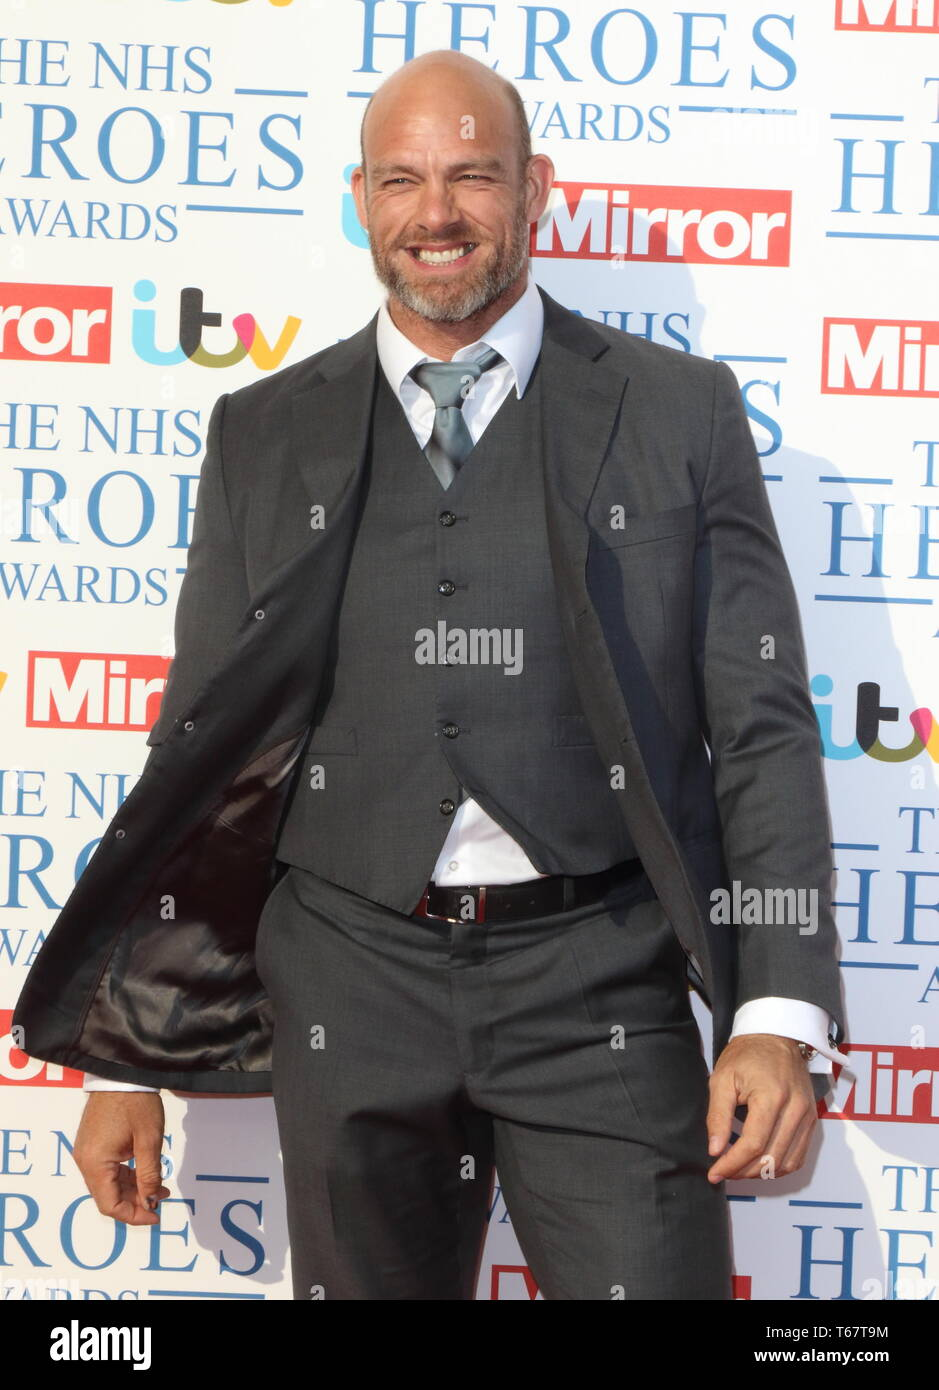 London, UK. James Haskell at NHS Heroes Awards at the London Hilton Park Lane, London on Monday 14 May 2018. Ref: LMK73-J2025-150518 Keith Mayhew/Landmark Media WWW.LMKMEDIA.COM - Stock Image